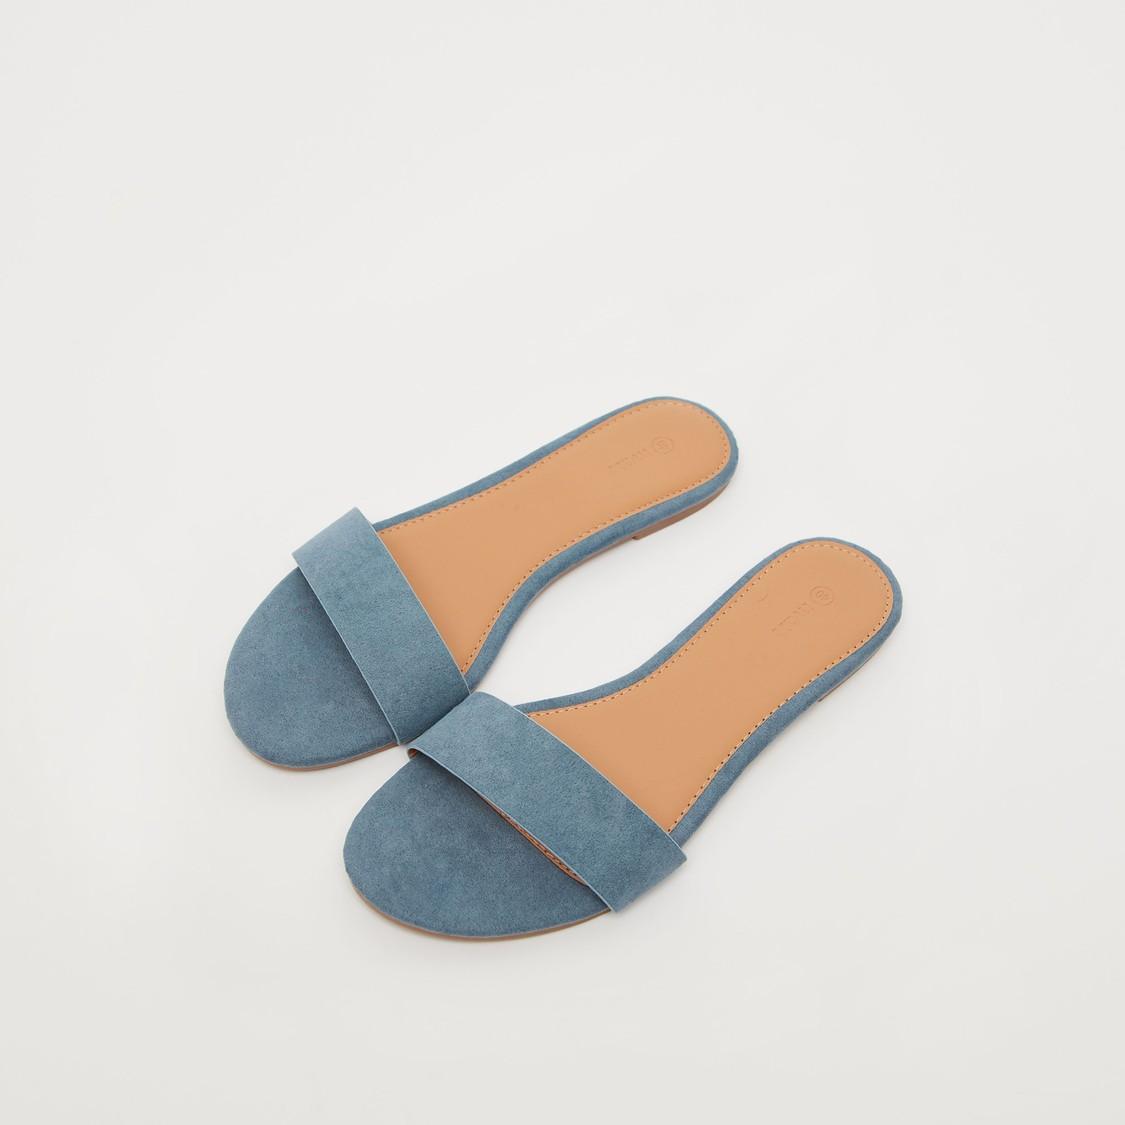 Solid Slip-On Open Toe Flat Sandals